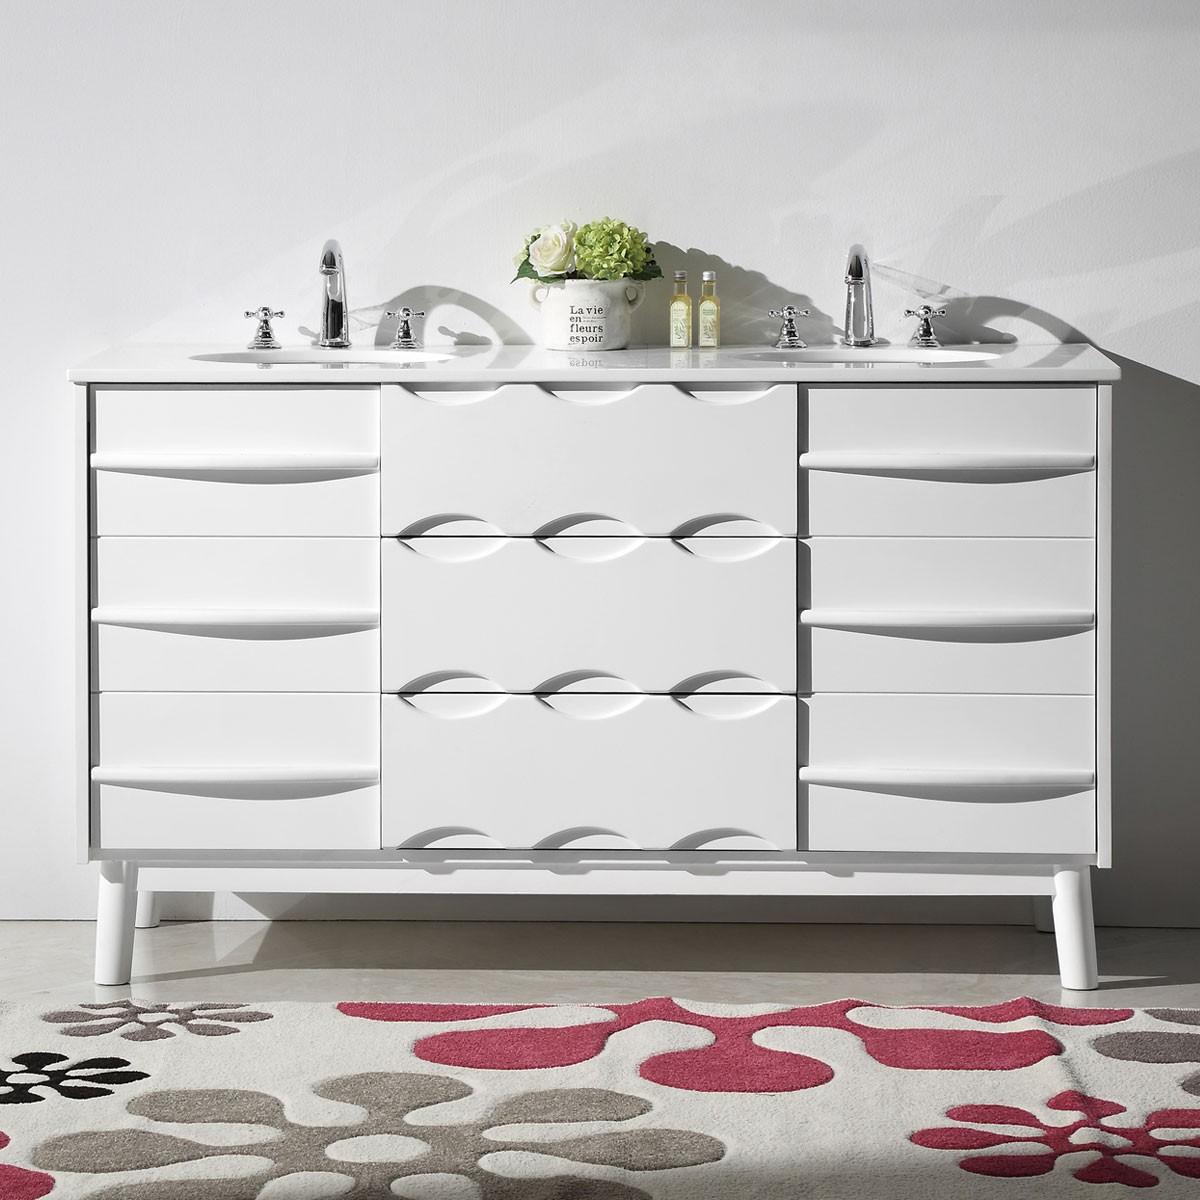 60 In. Boxwood Freestanding Bathroom Vanity (DK-5060)